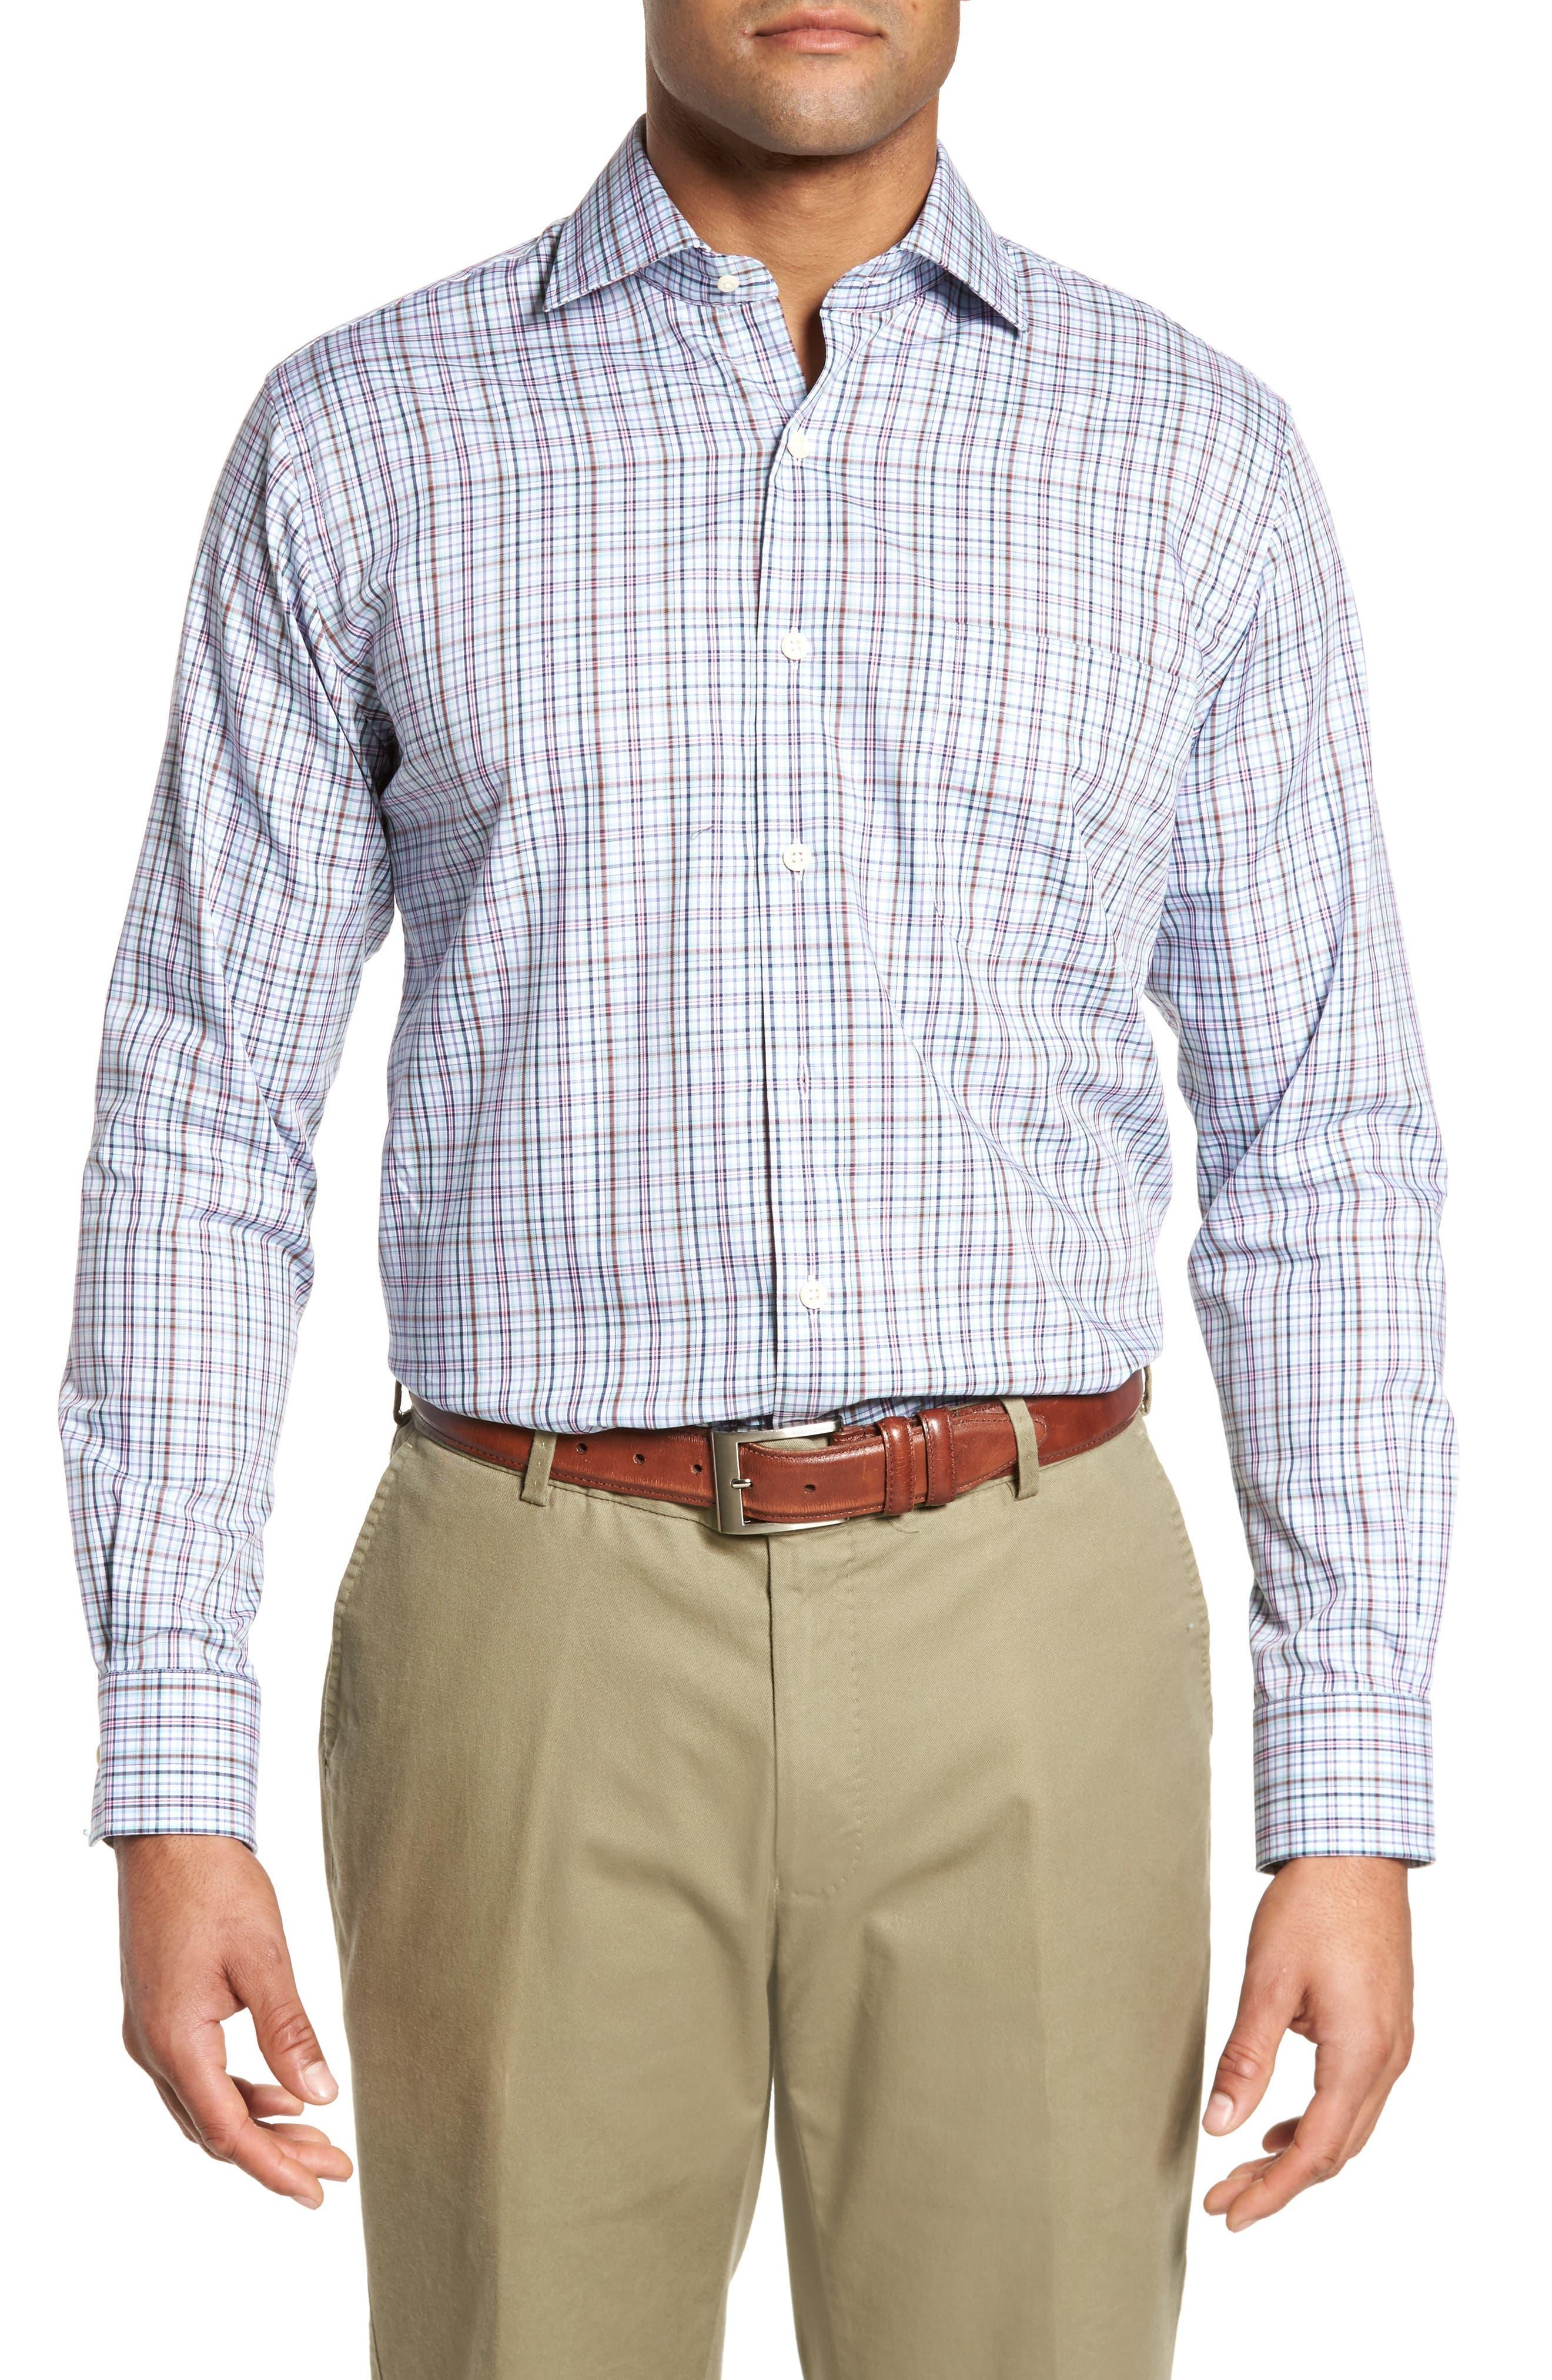 Crown Ease Tango Pinwheel Regular Fit Sport Shirt,                             Main thumbnail 1, color,                             453